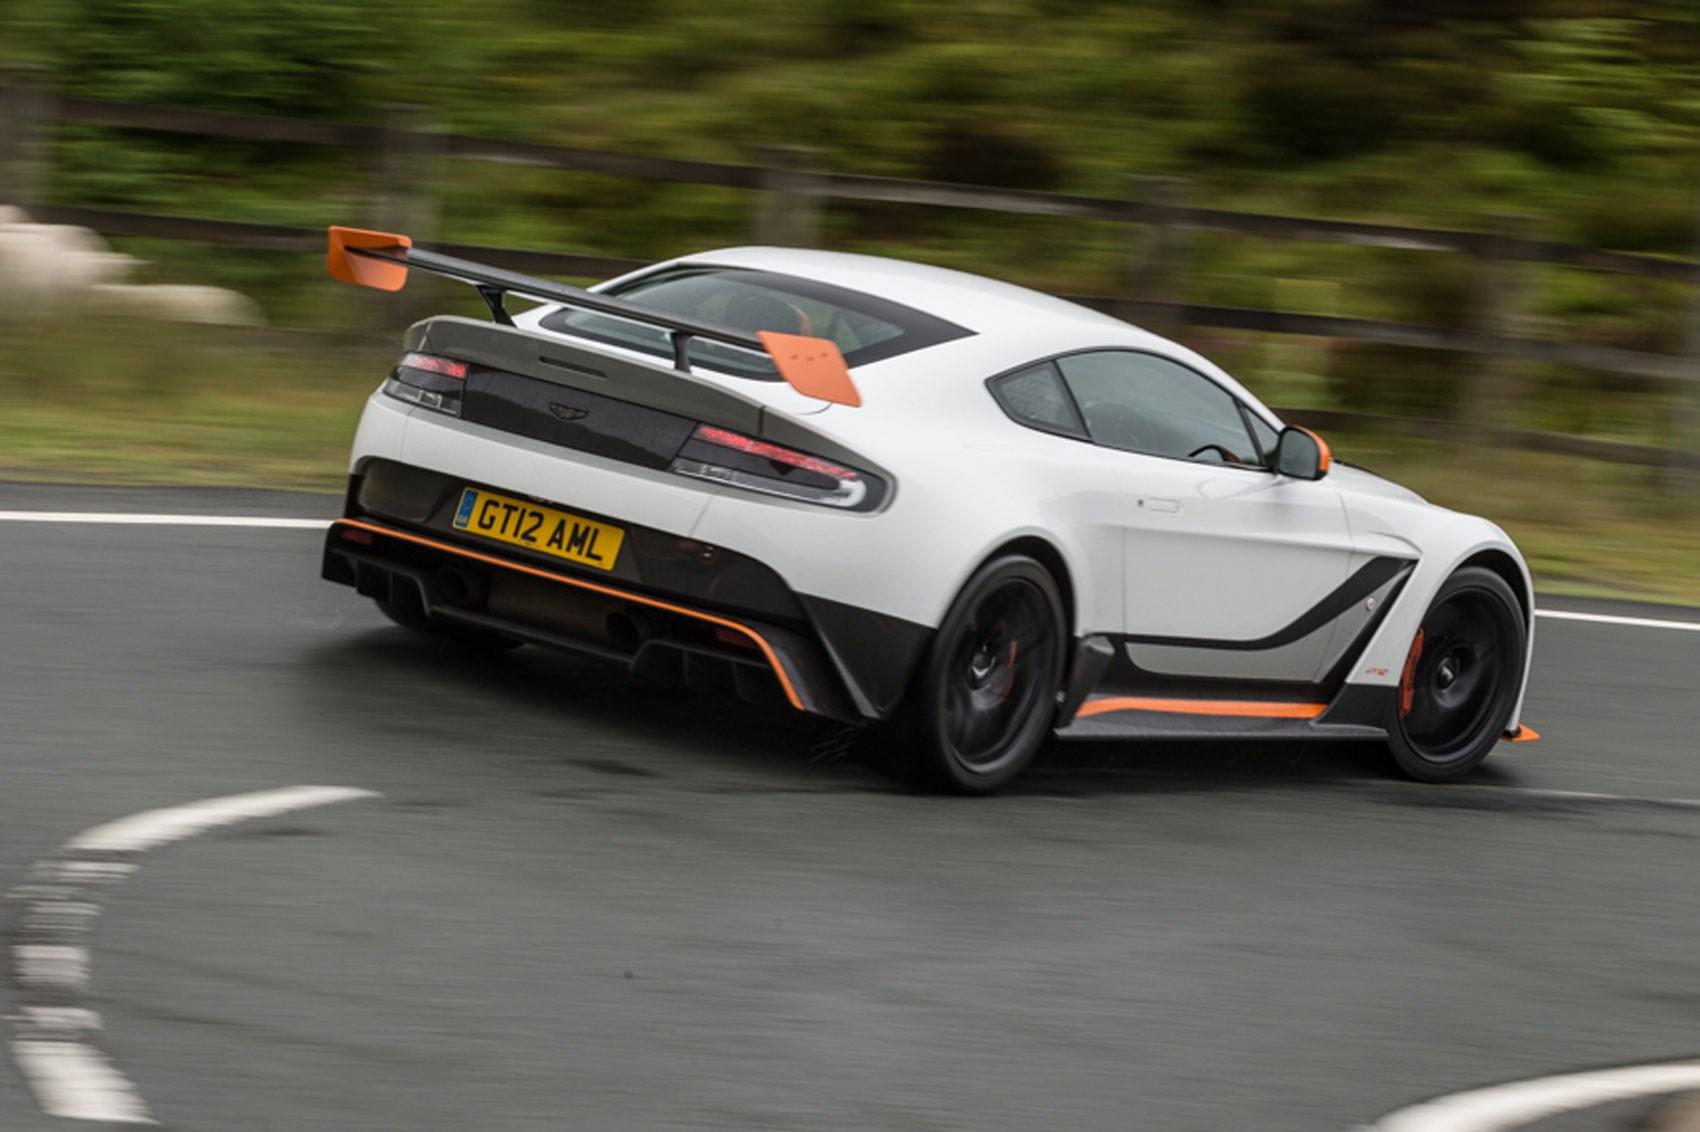 Aston Martin Vantage Gt12 2015 Review Car Magazine